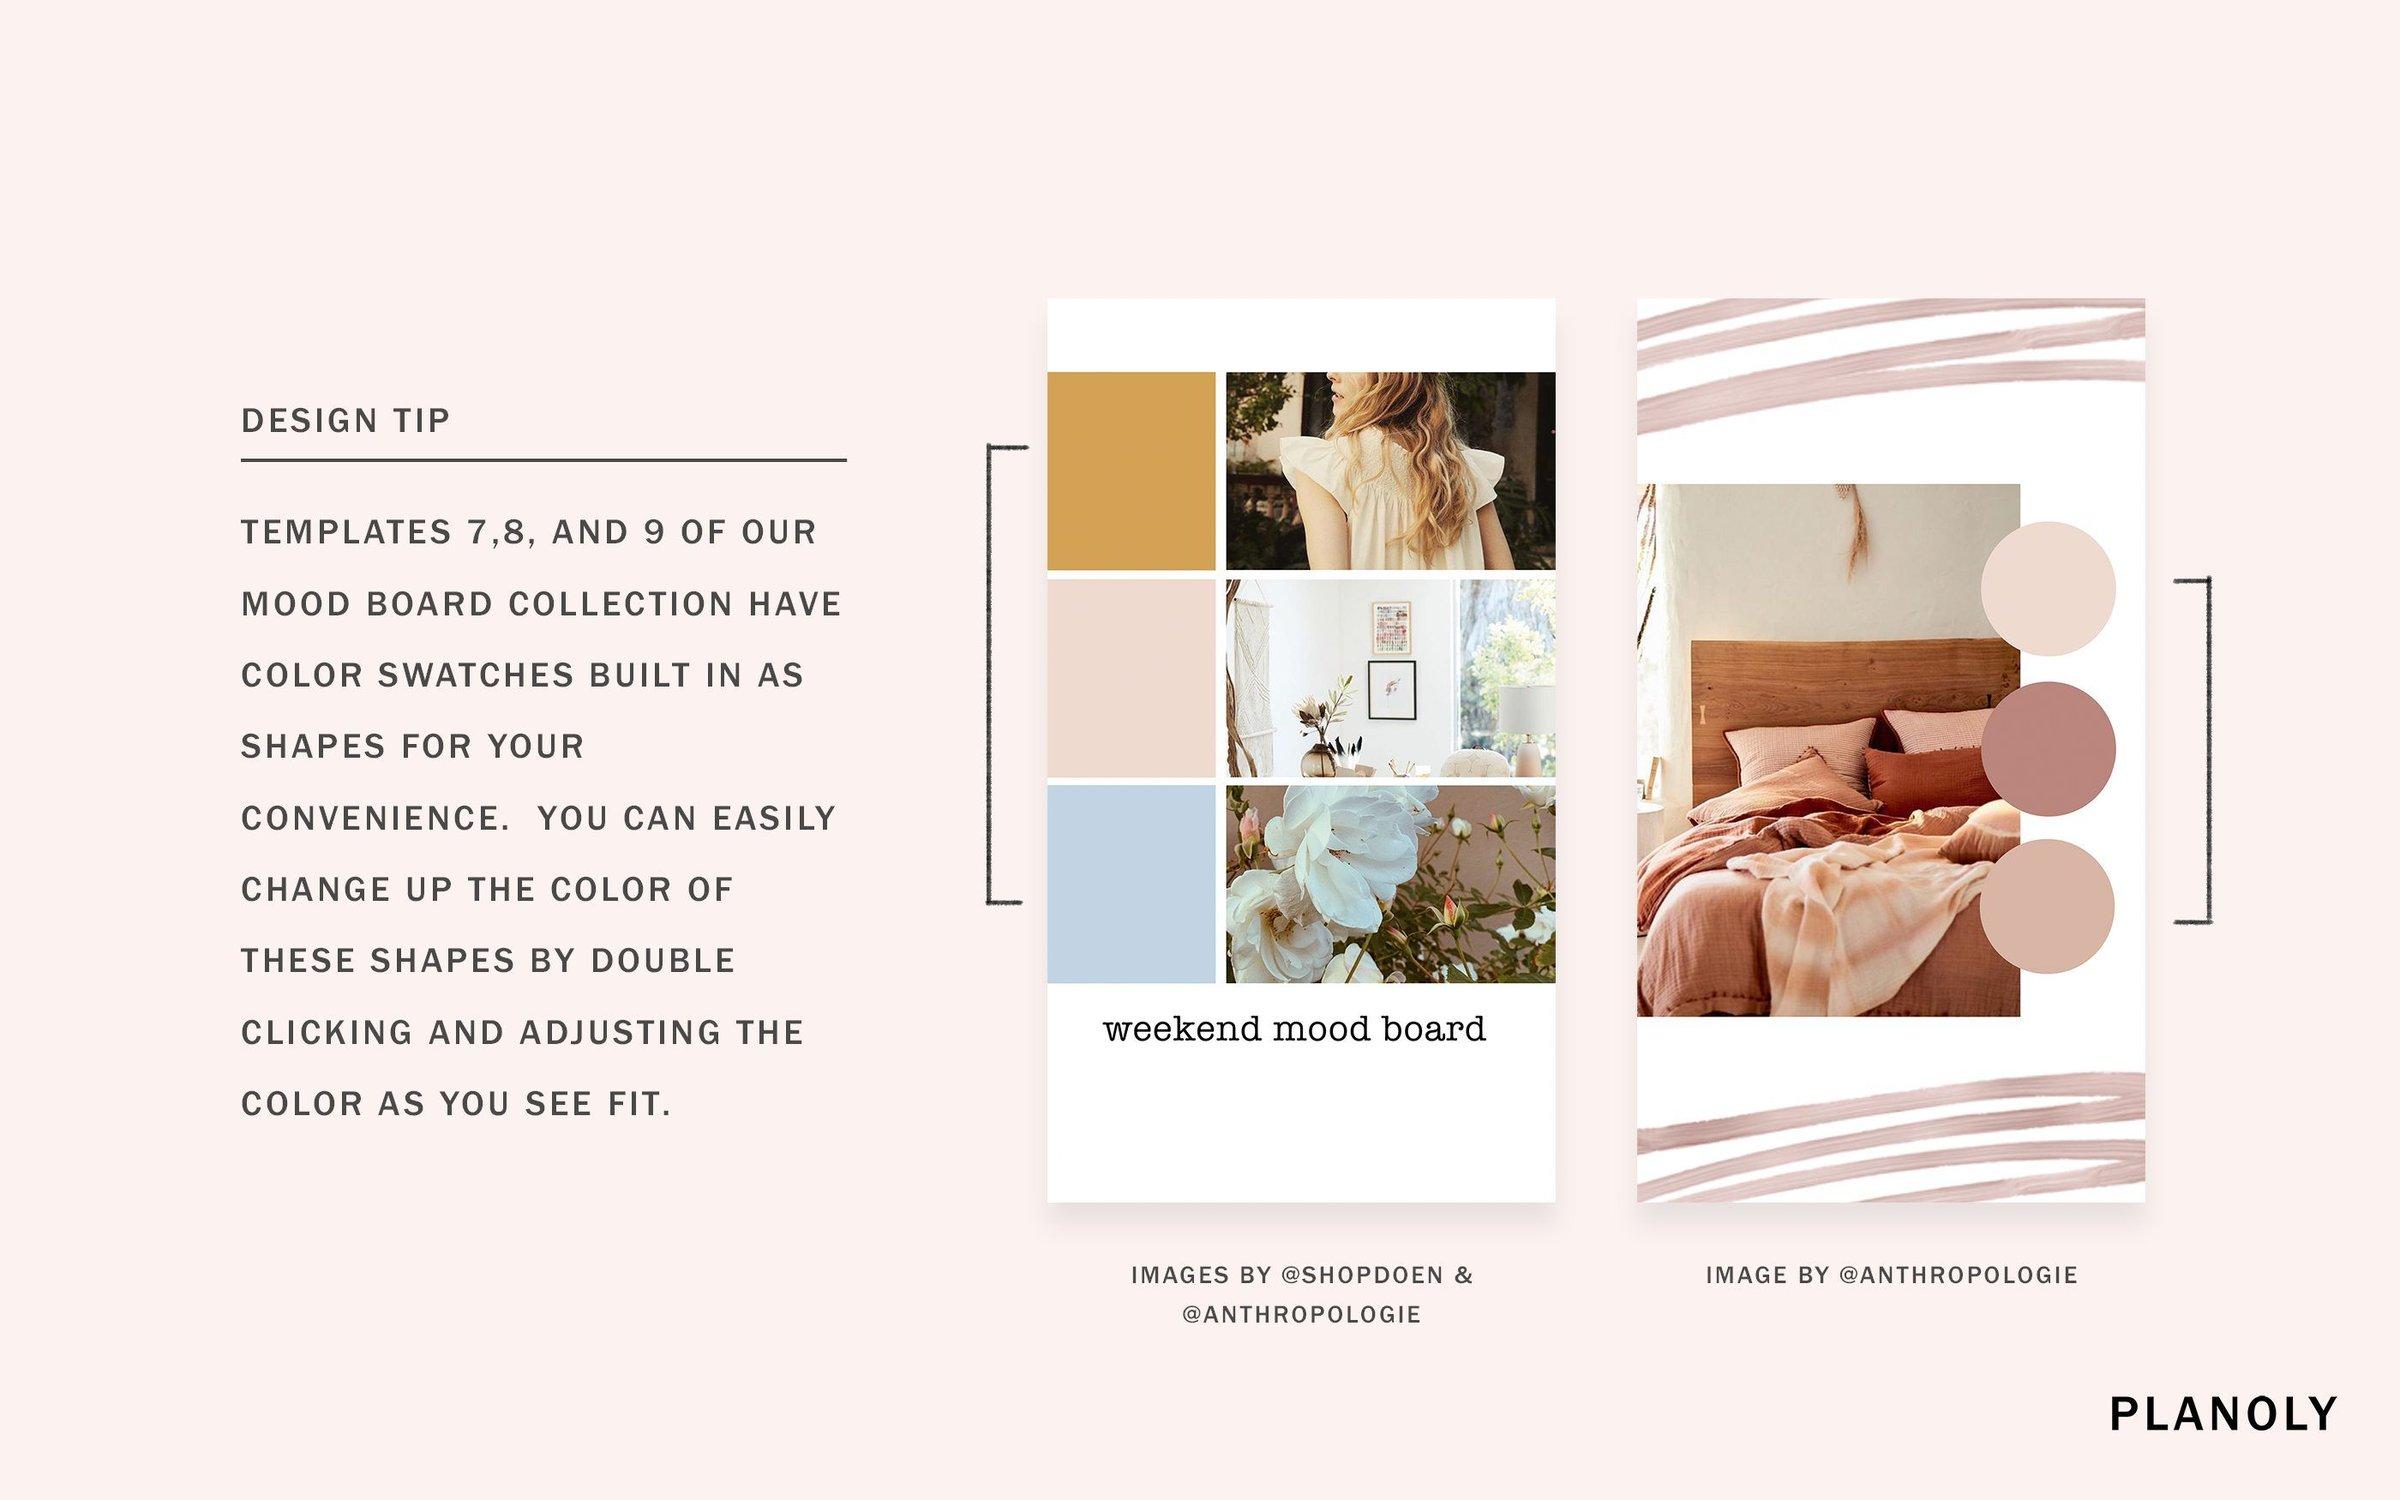 Planoly-Blog-Post-Angela-Fink-StoriesEdit-Collection-Image-5